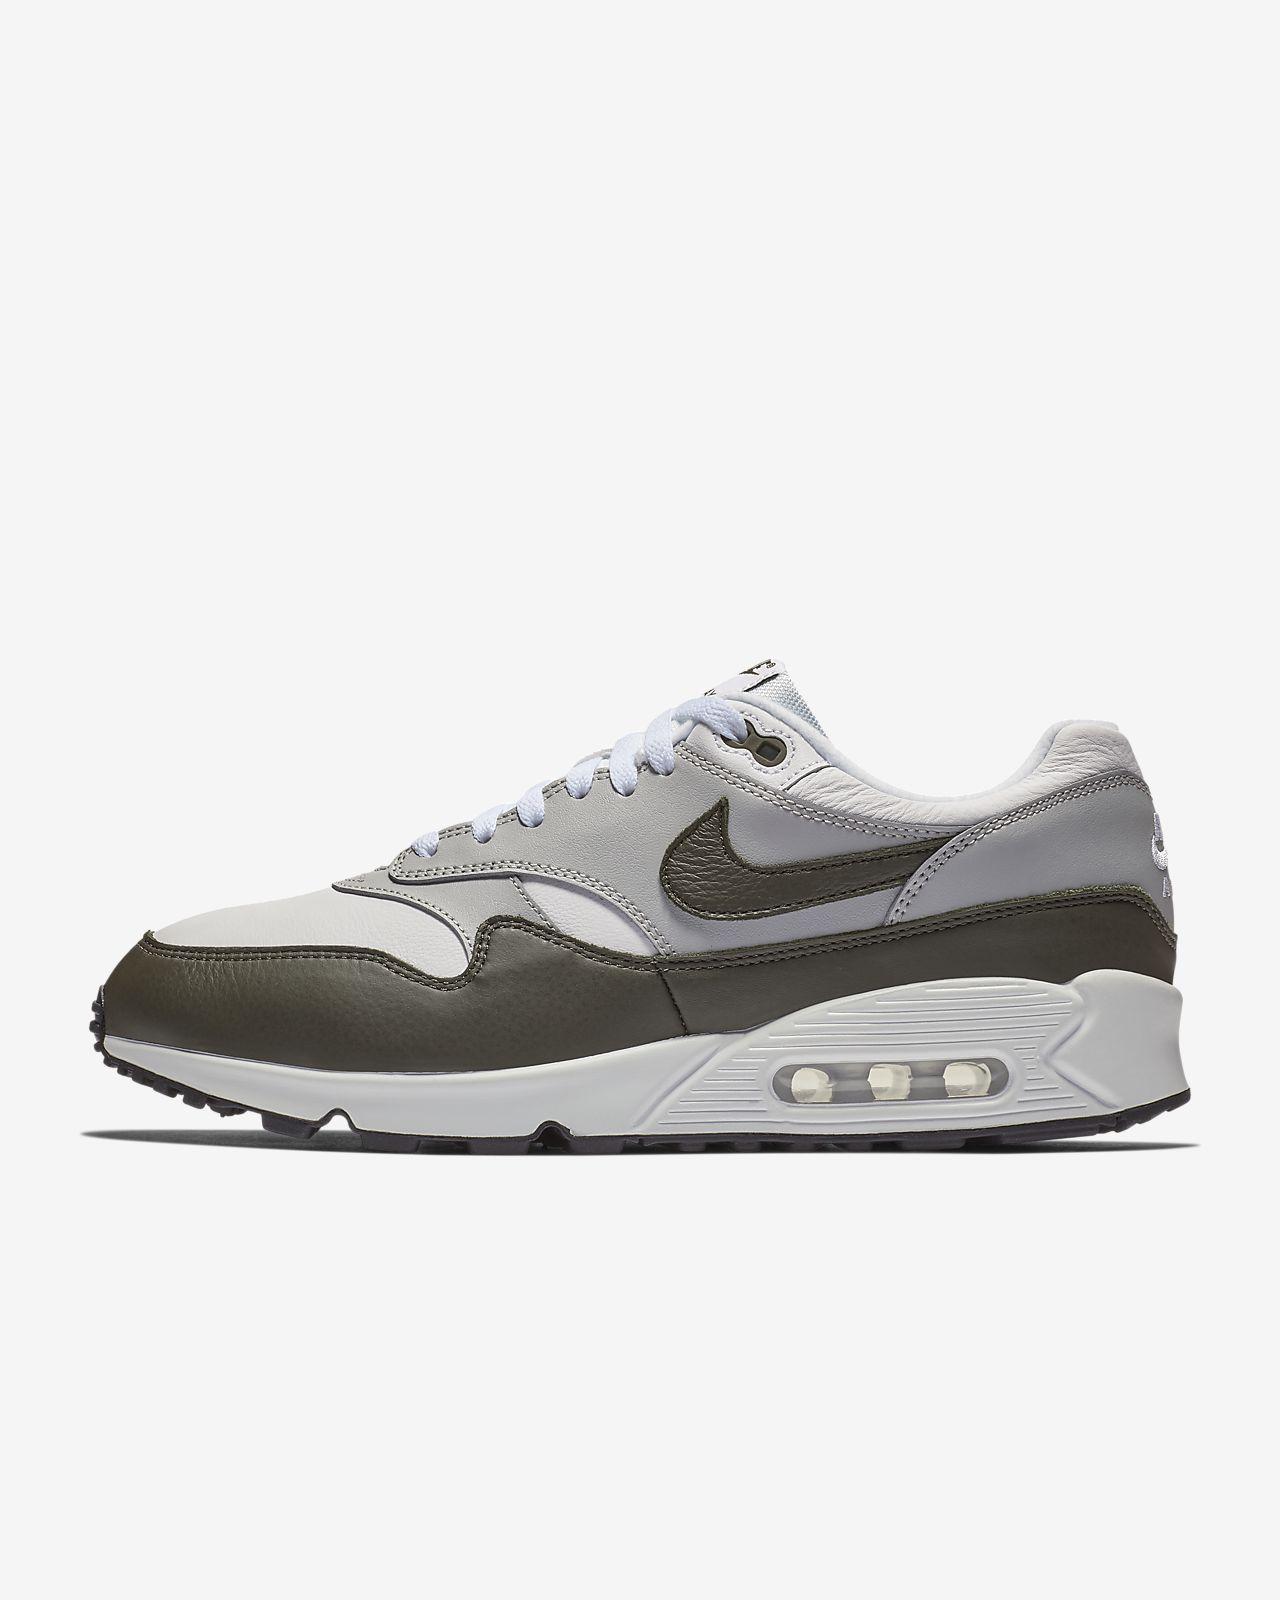 quality design f3e2b d8fb5 Men s Shoe. Nike Air Max 90 1